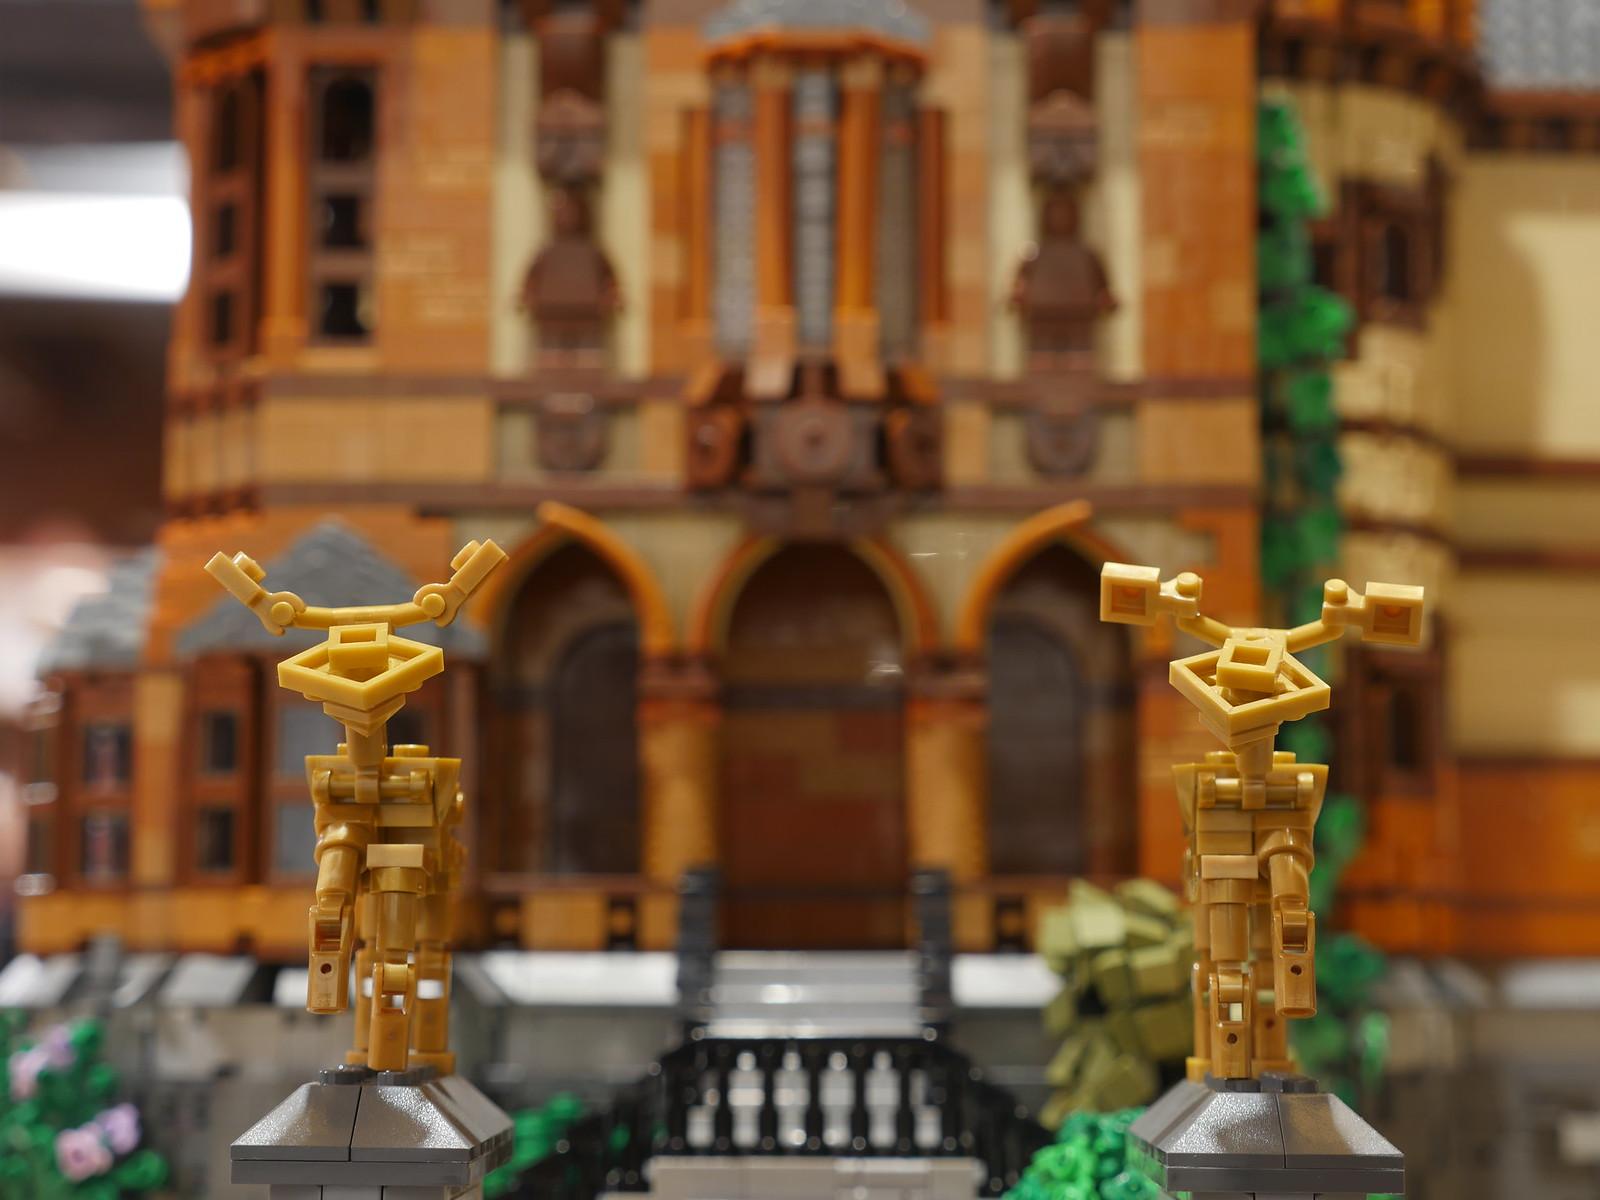 LEGO castle architecture